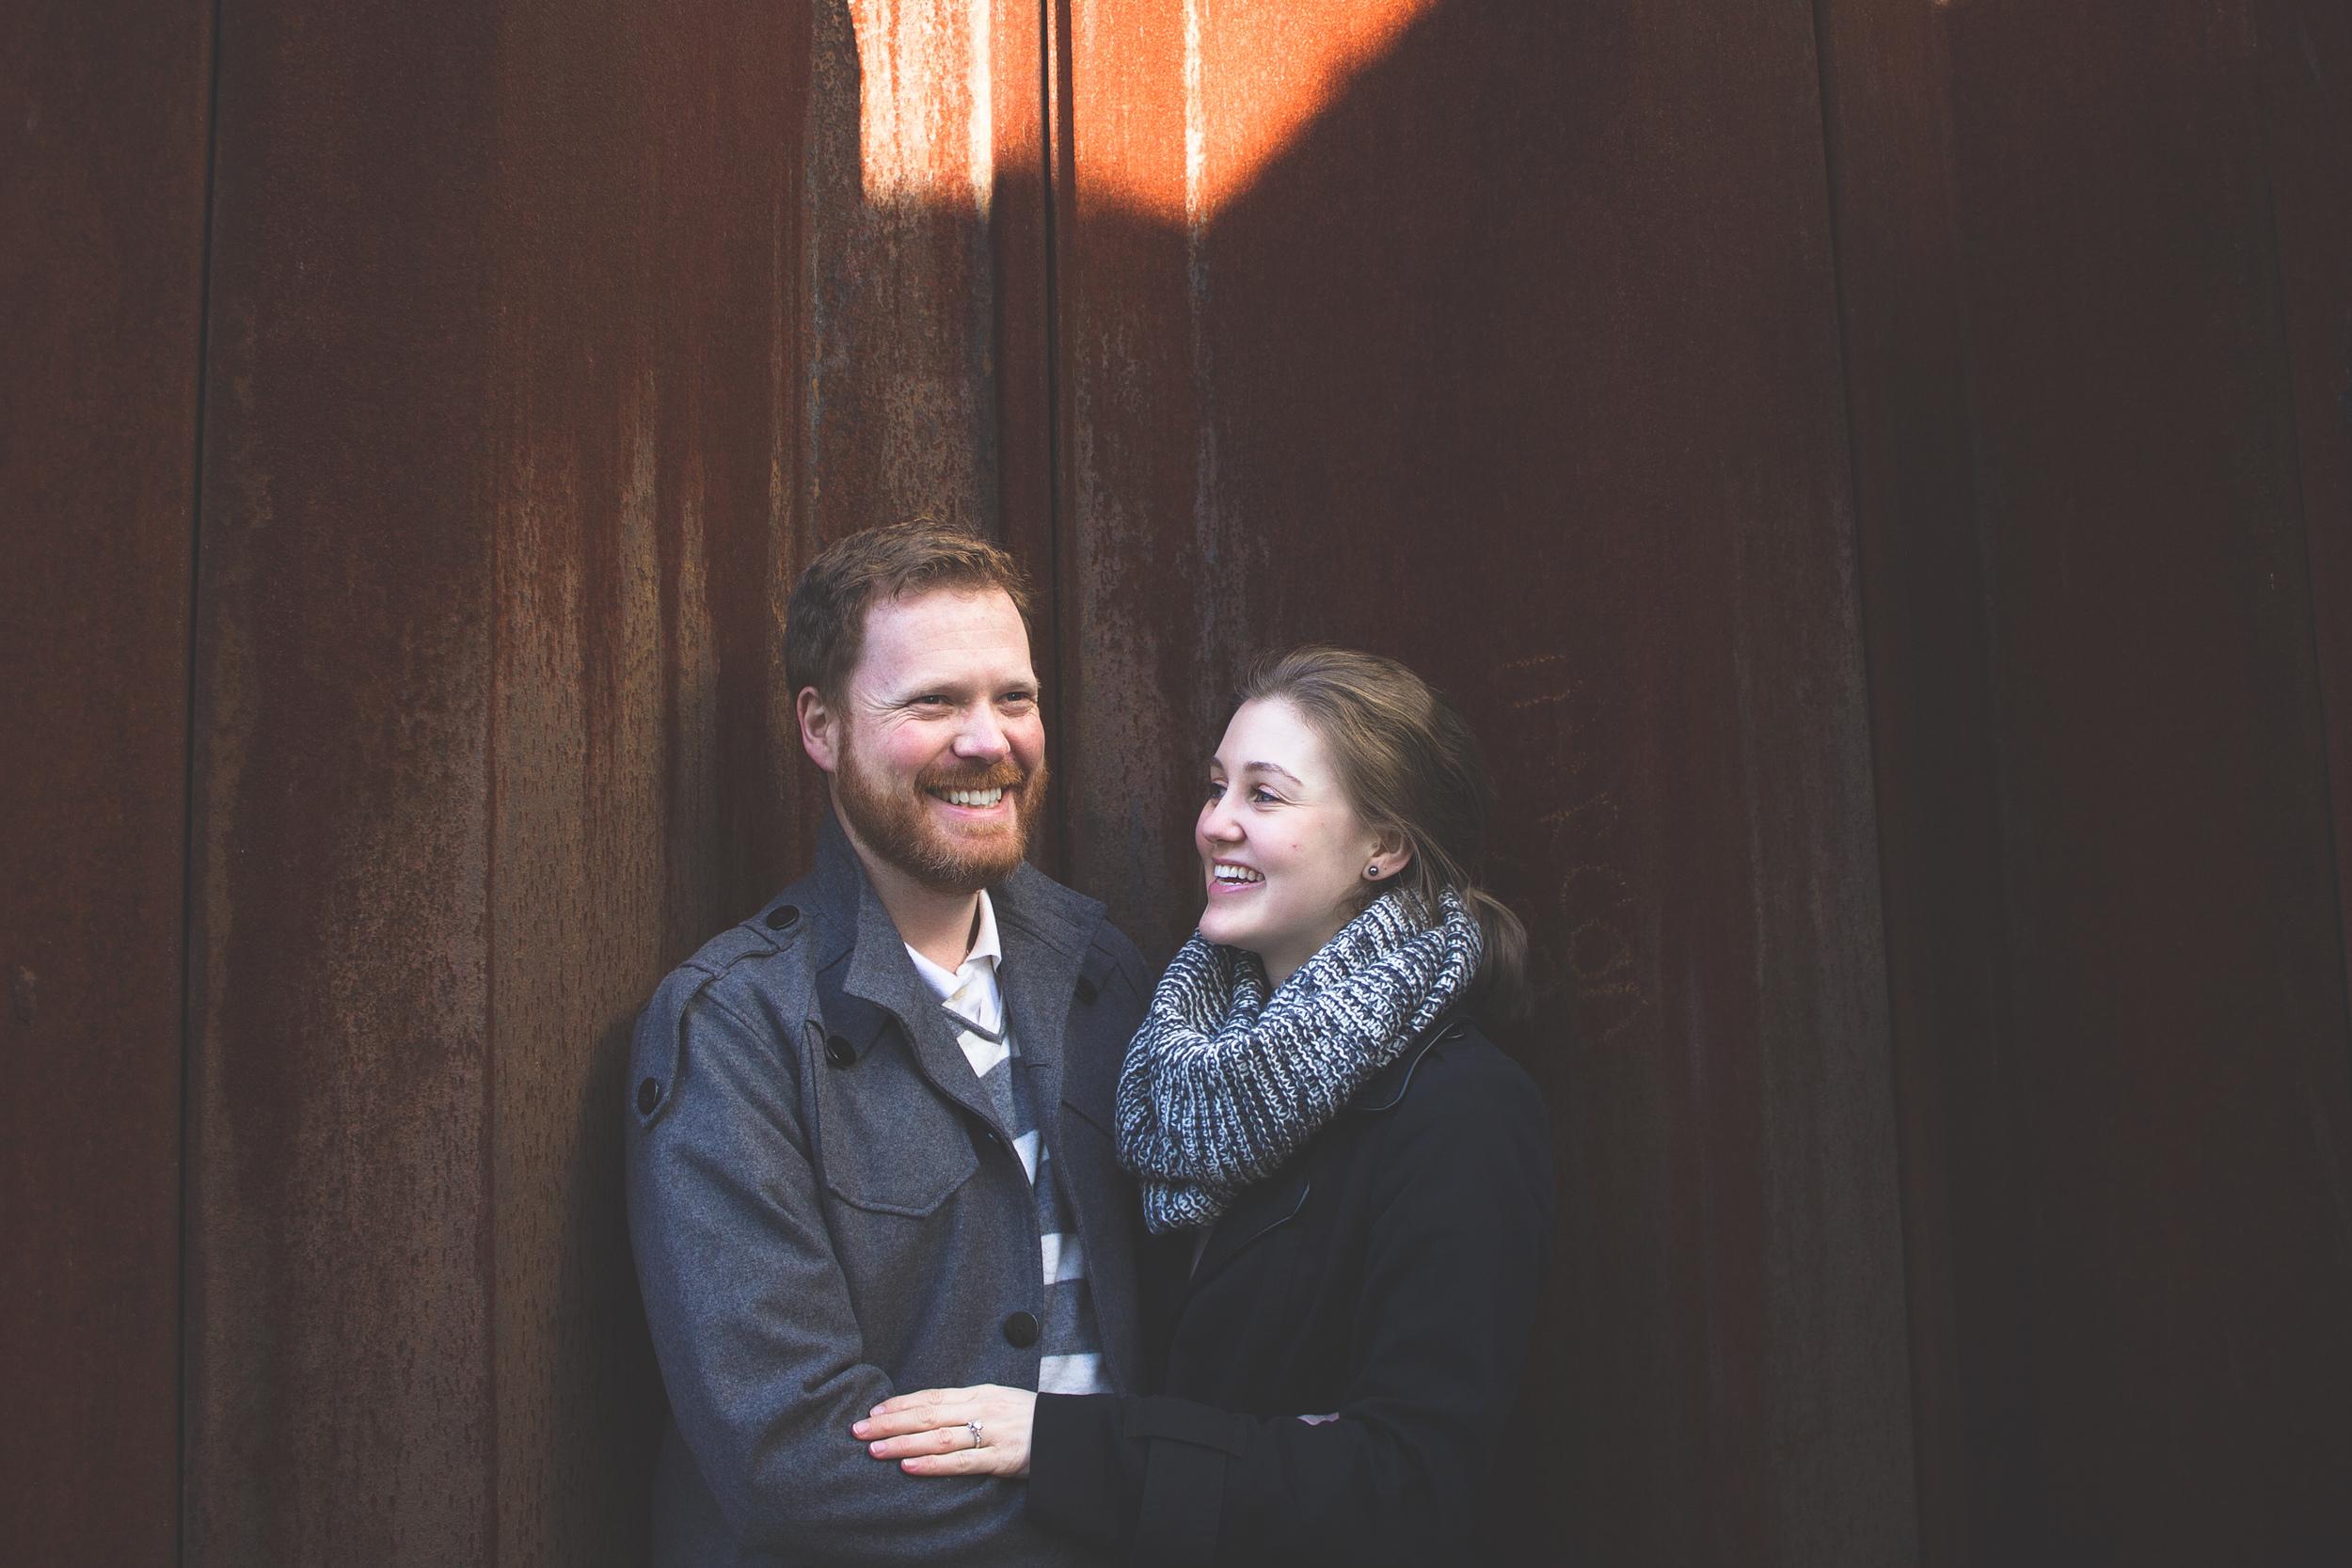 vancouver_photographer_couple_engagement_rk-5.jpg